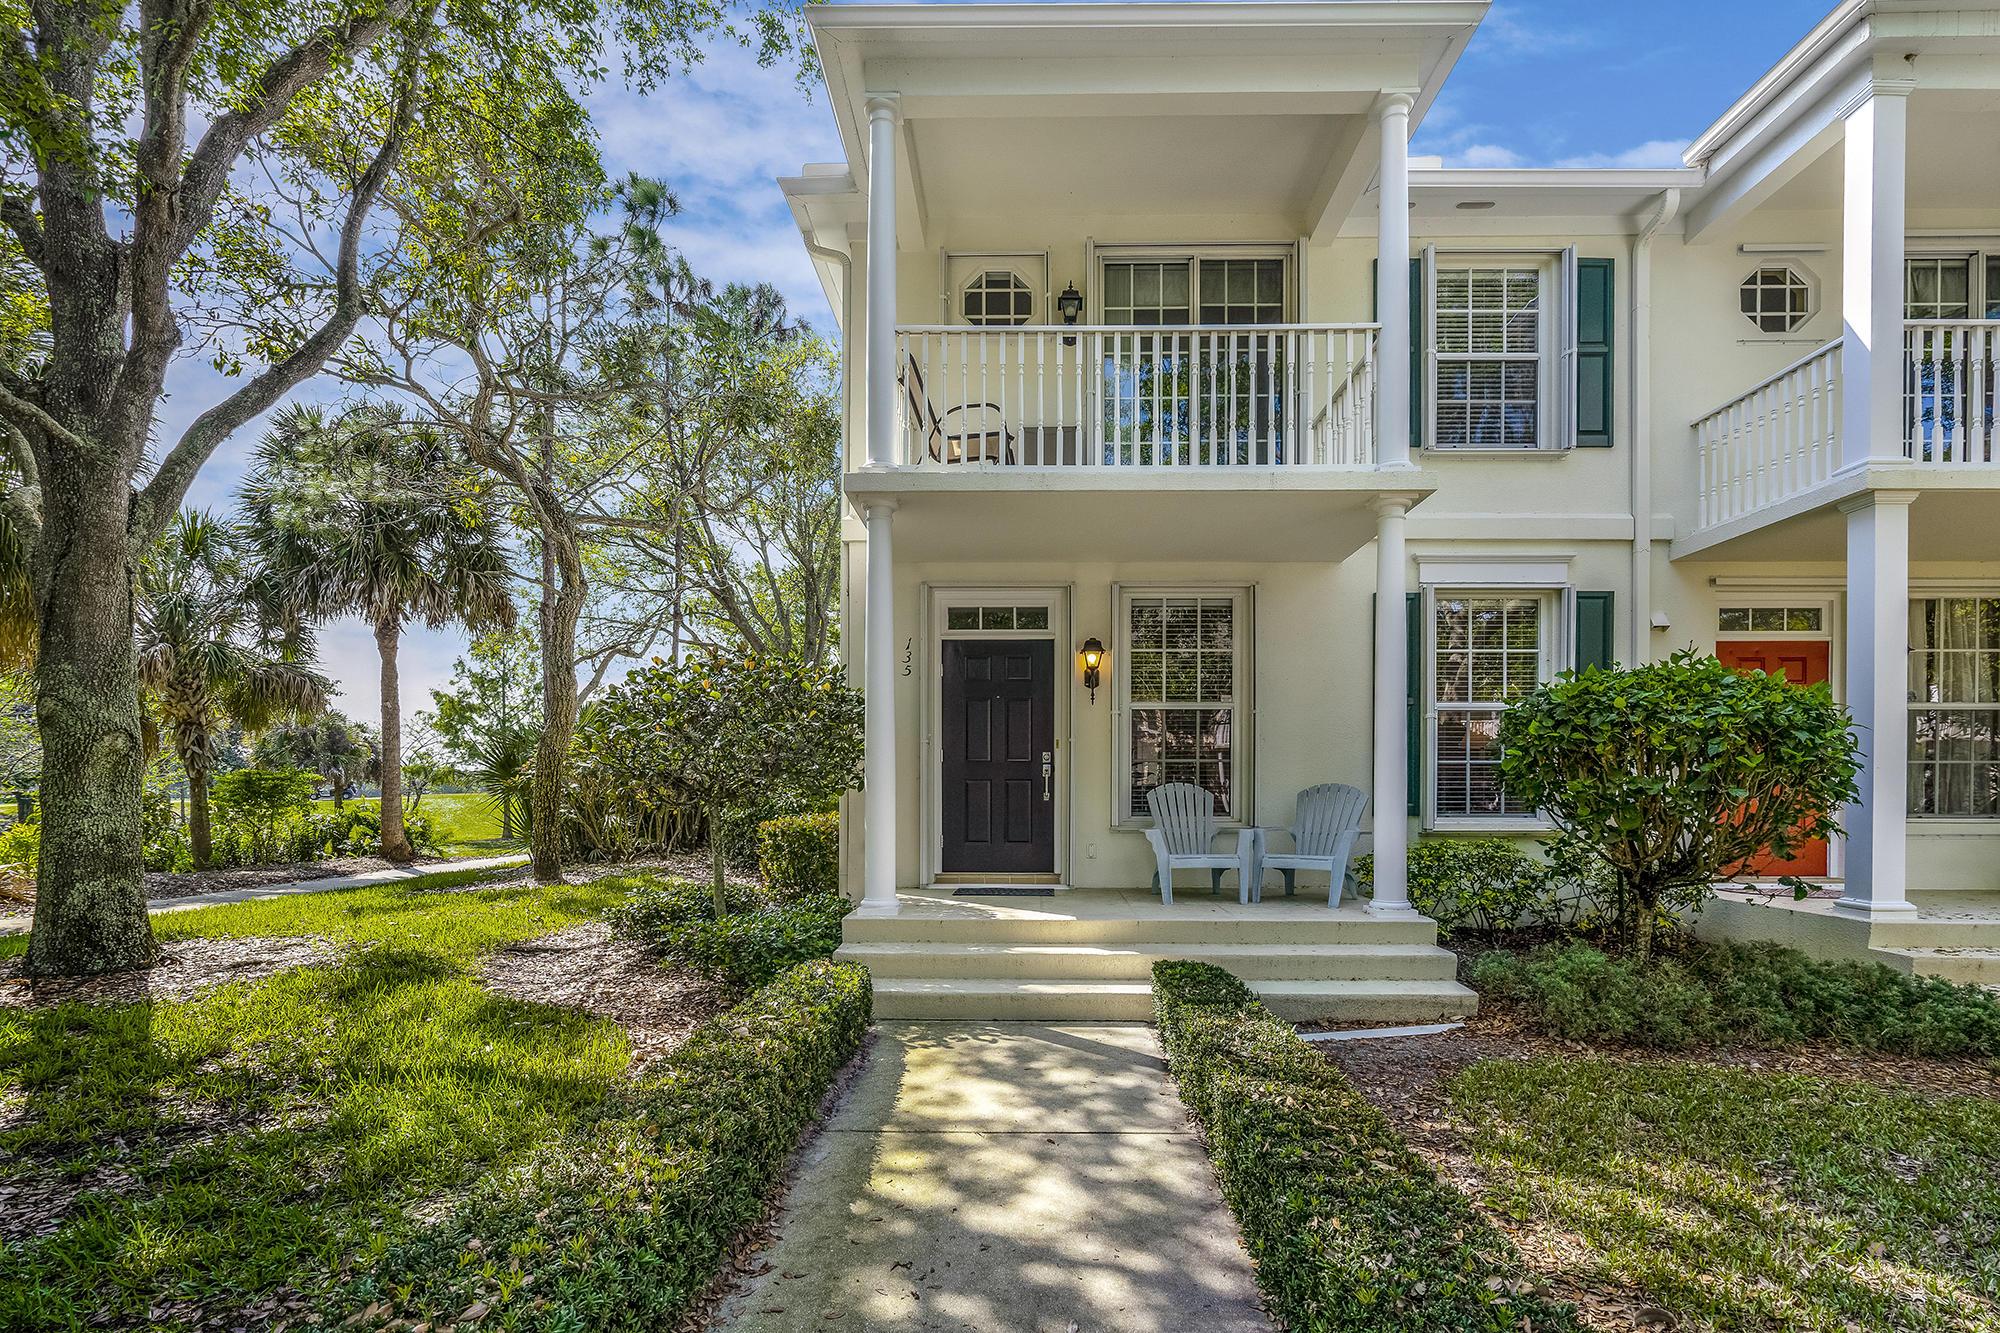 135 Courtenay Court, Jupiter, Florida 33458, 3 Bedrooms Bedrooms, ,2.1 BathroomsBathrooms,A,Townhouse,Courtenay,RX-10512737